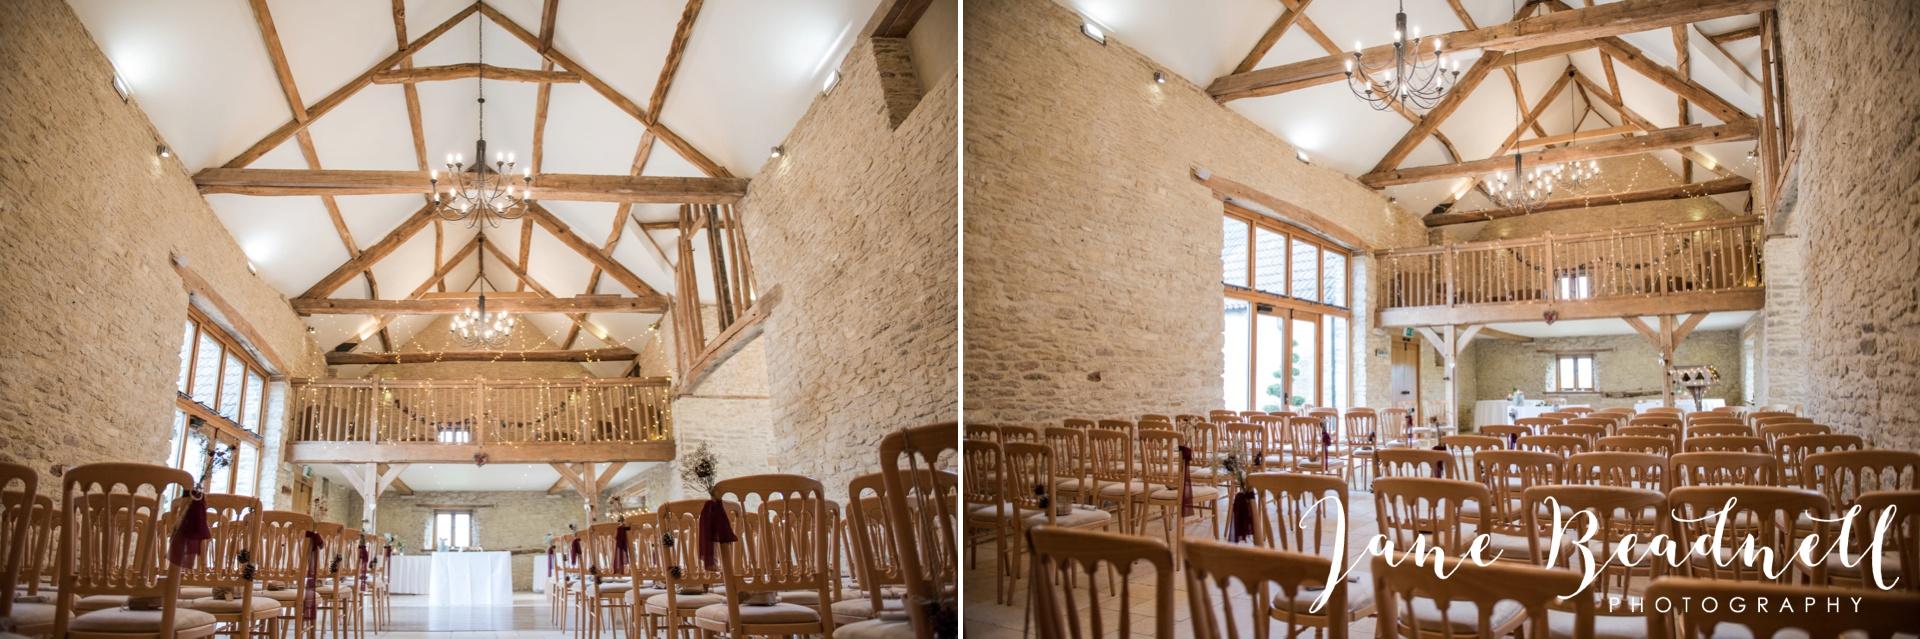 The Kingcote Barn Bristol Yorkshire and destination wedding photographer Jane Beadnell Photography_0023